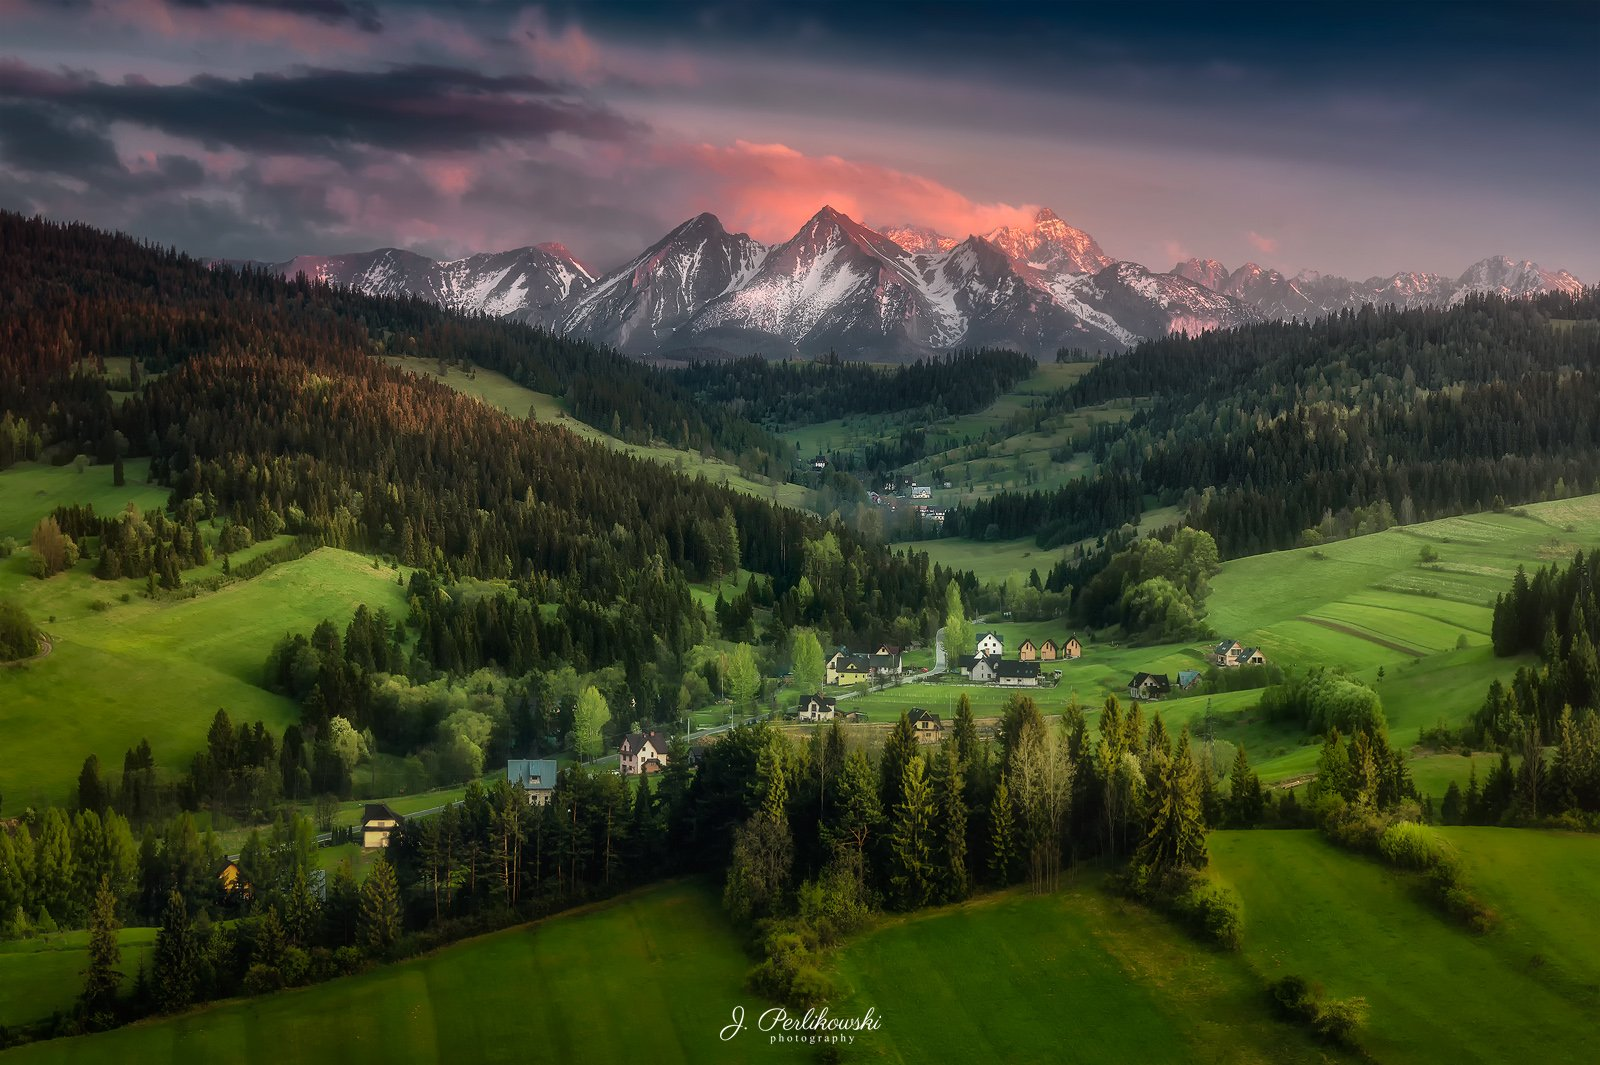 tatra, tatra mountains, mountains,spring, spring vibes, fields, green, sunset,landscape, Perlikowski Jakub